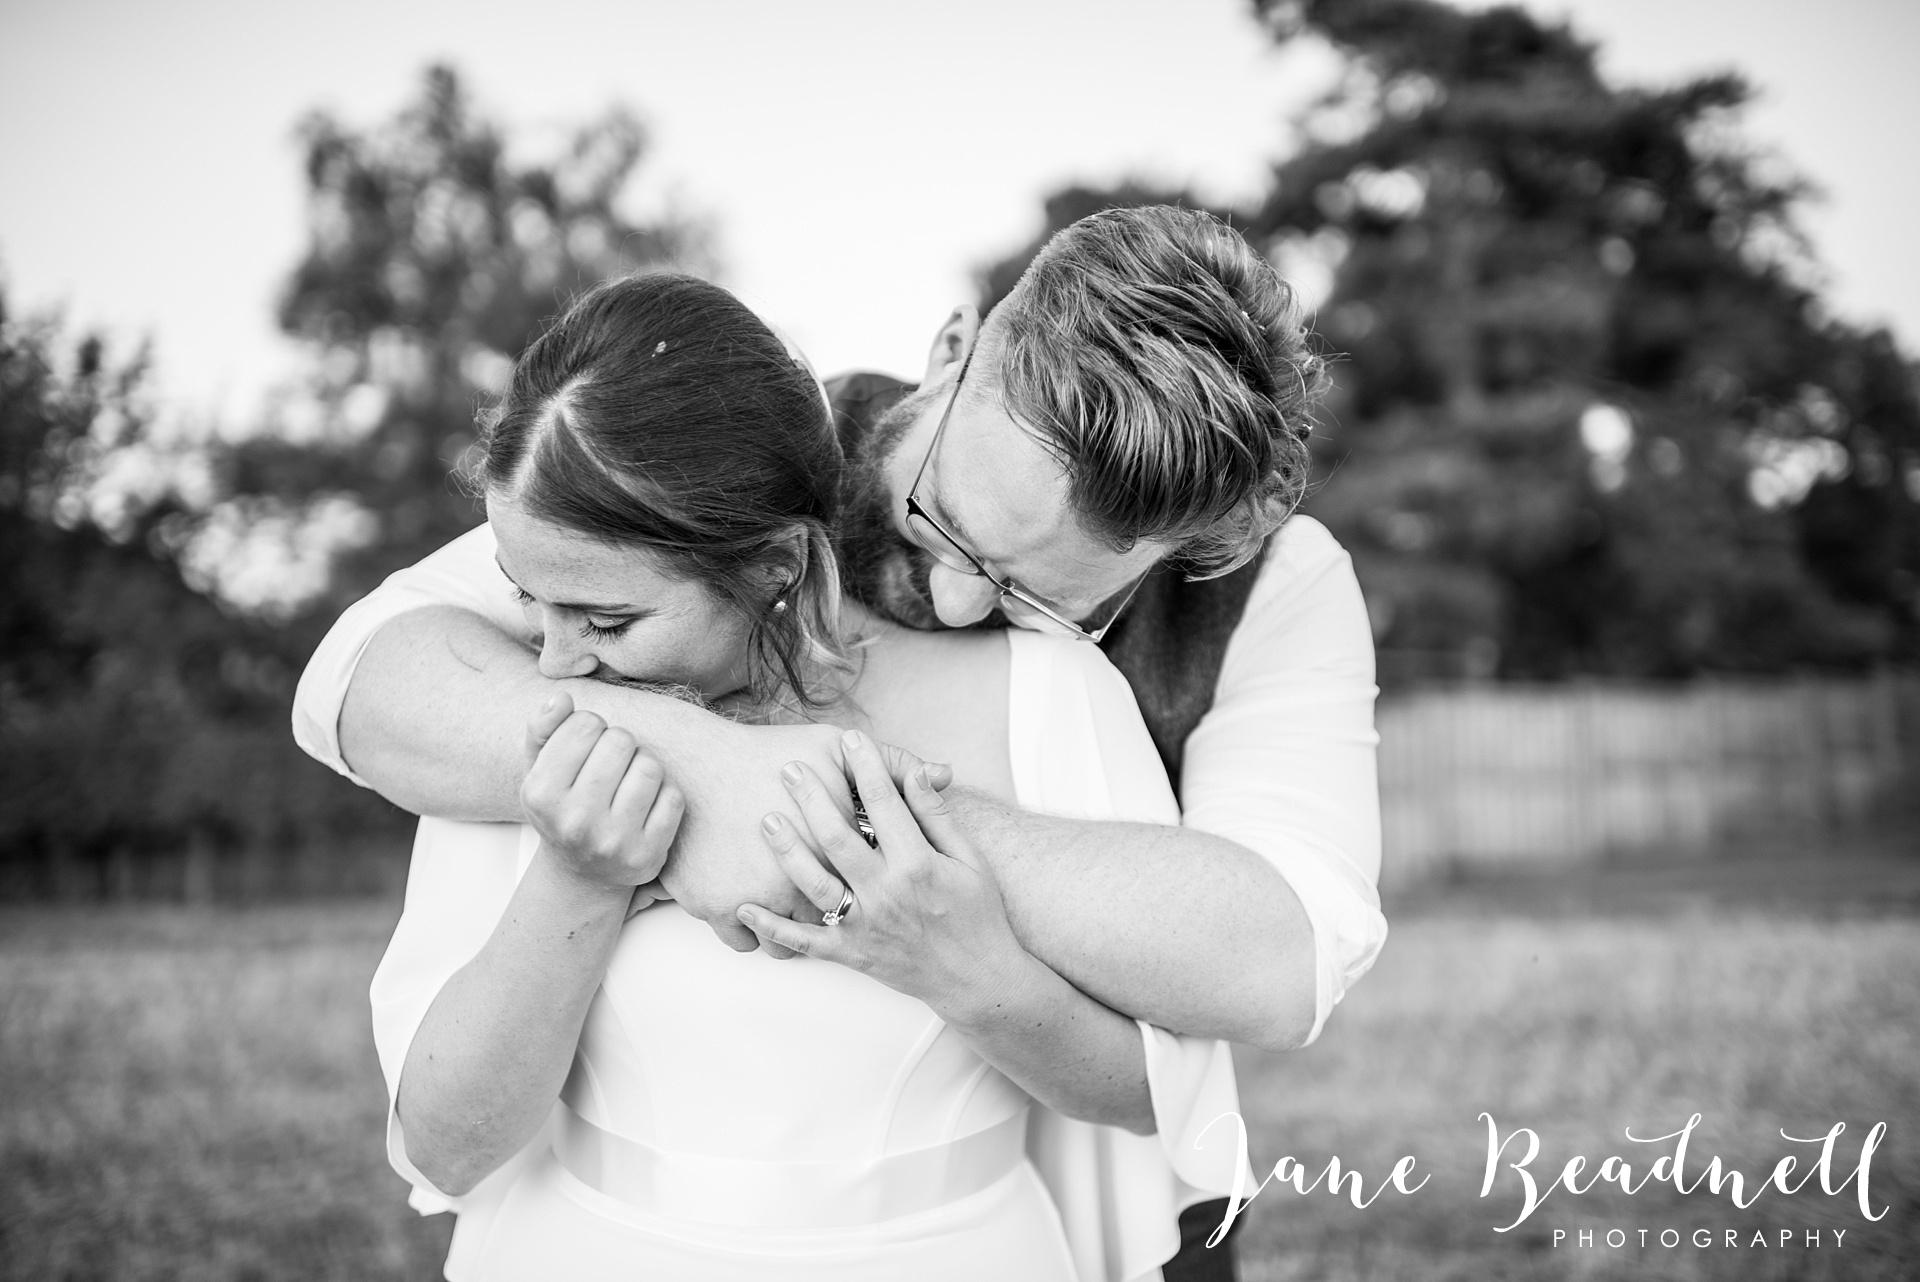 fine-art-wedding-photographer-jane-beadnell-yorkshire-wedding-photographer_0157